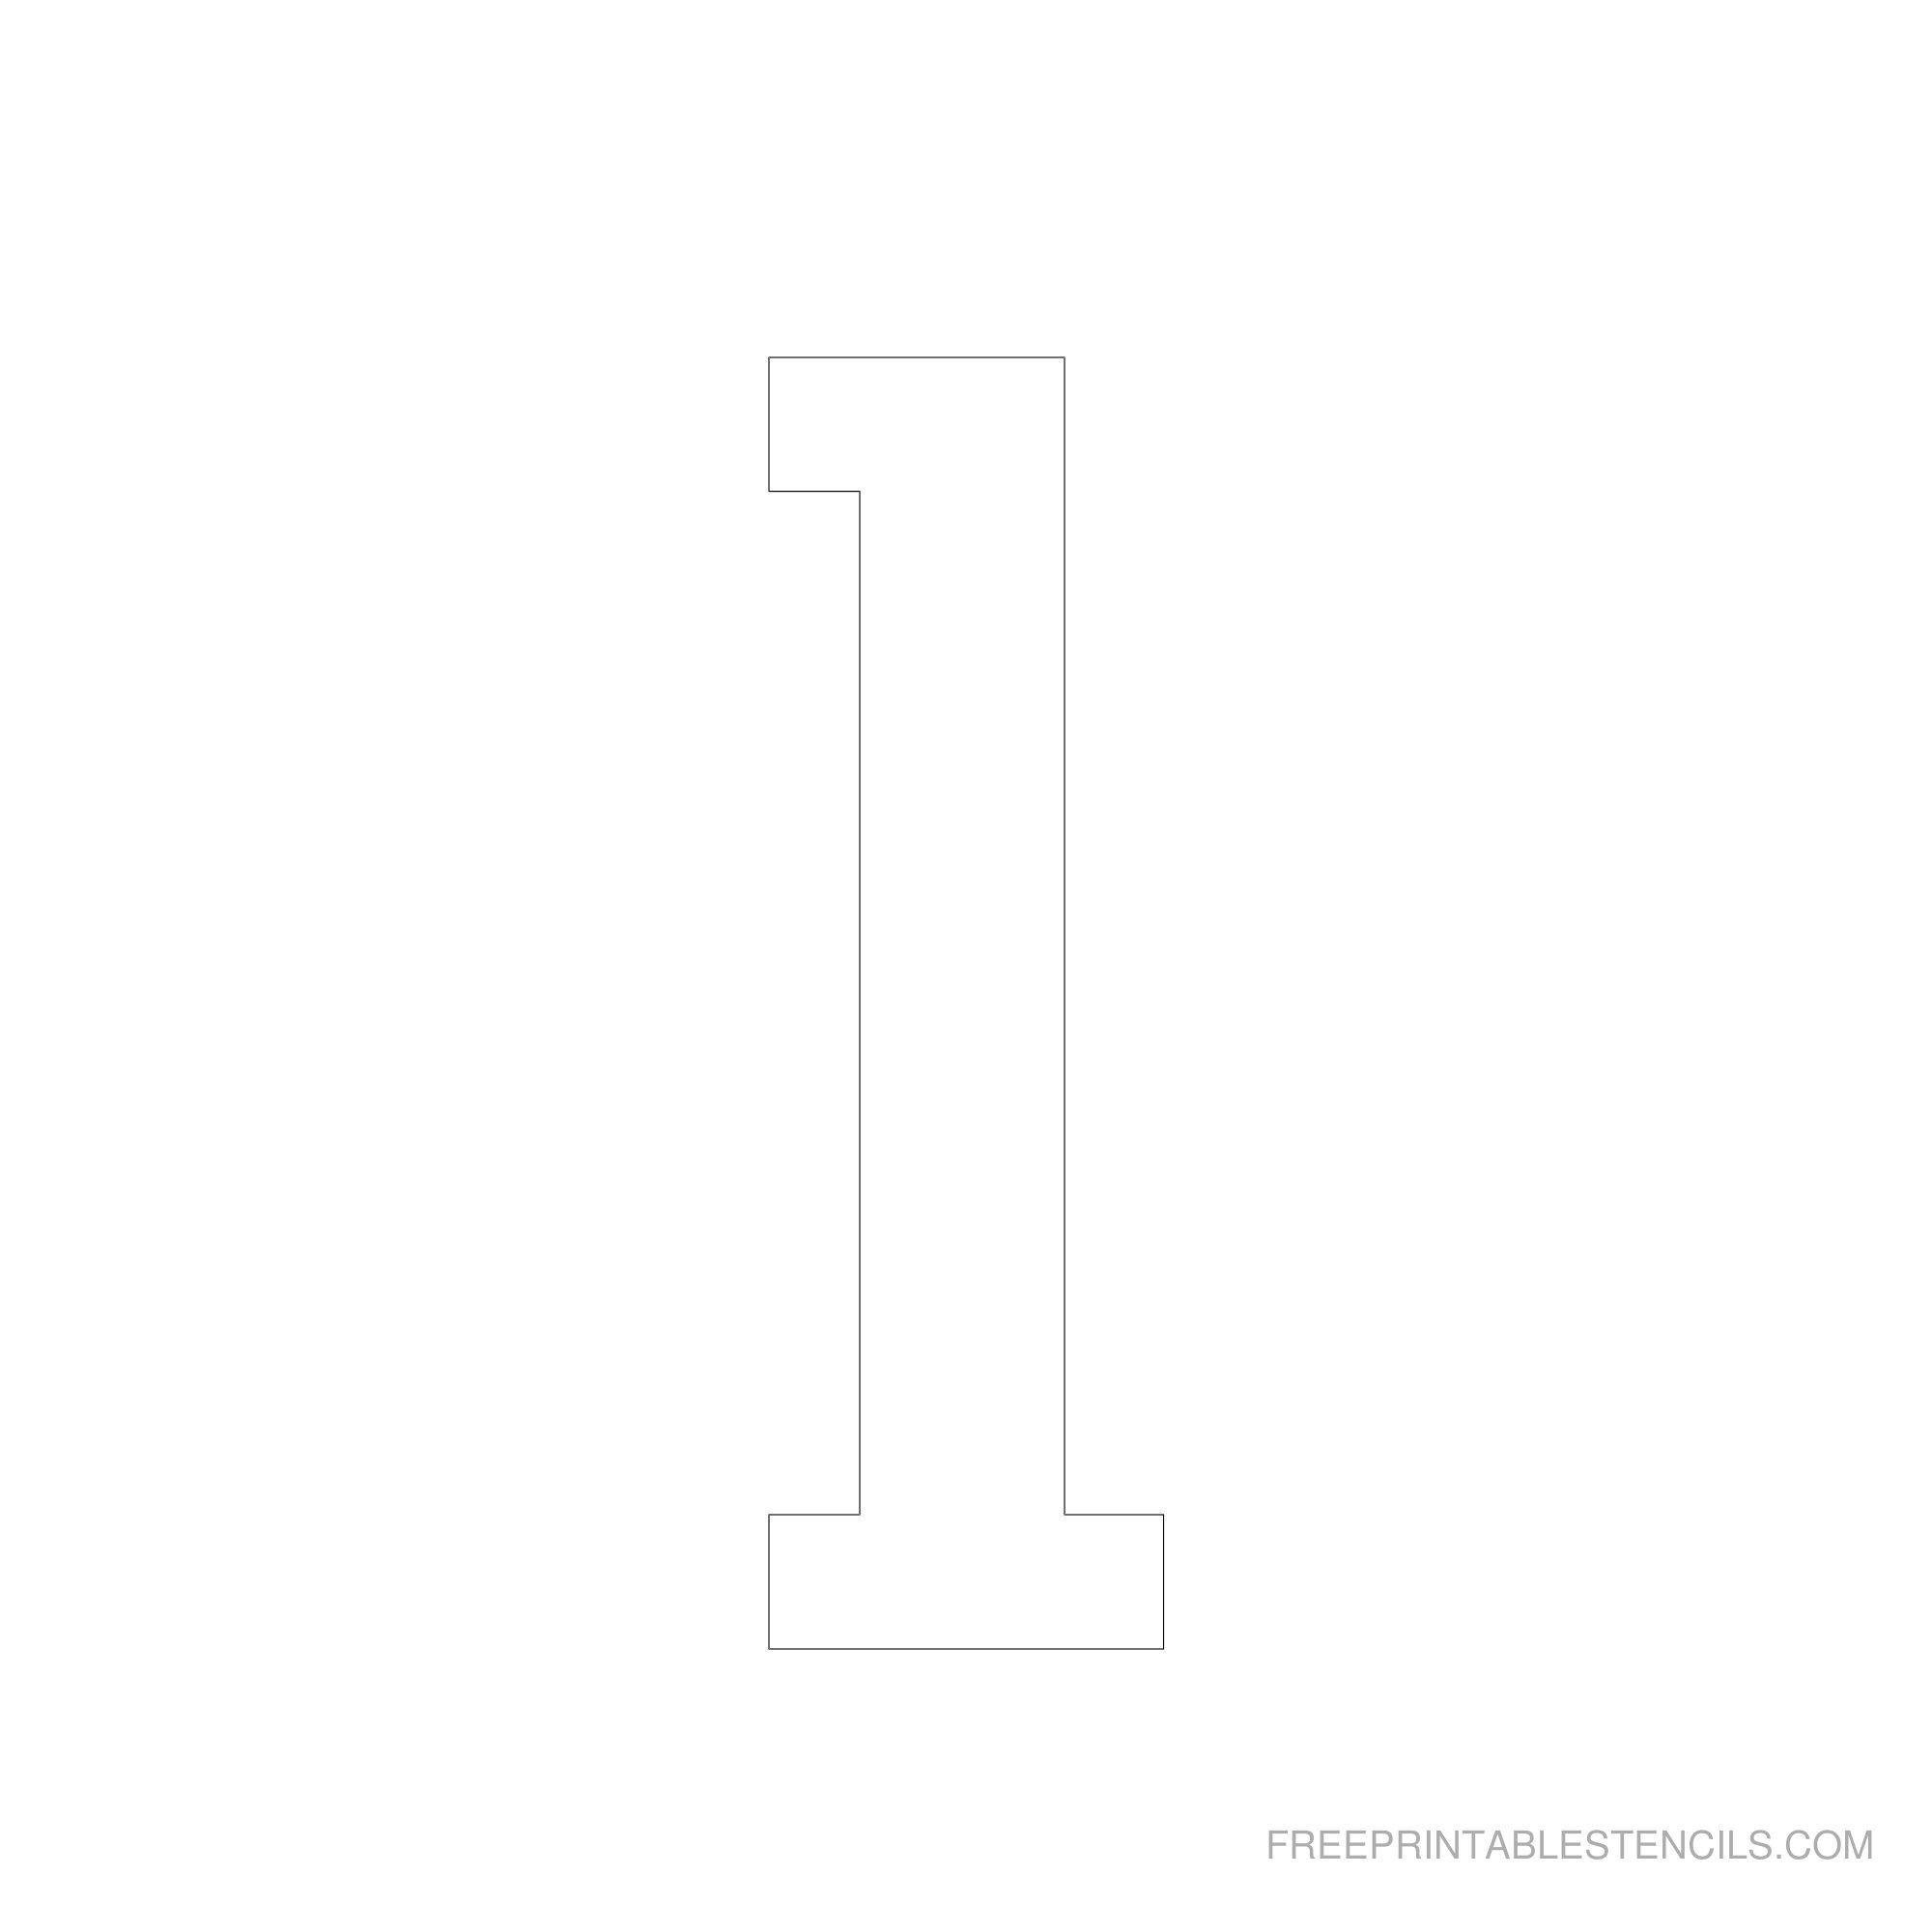 Printable 6 Inch Number Stencils 1-10   Free Printable Stencils - Free Printable Fancy Number Stencils